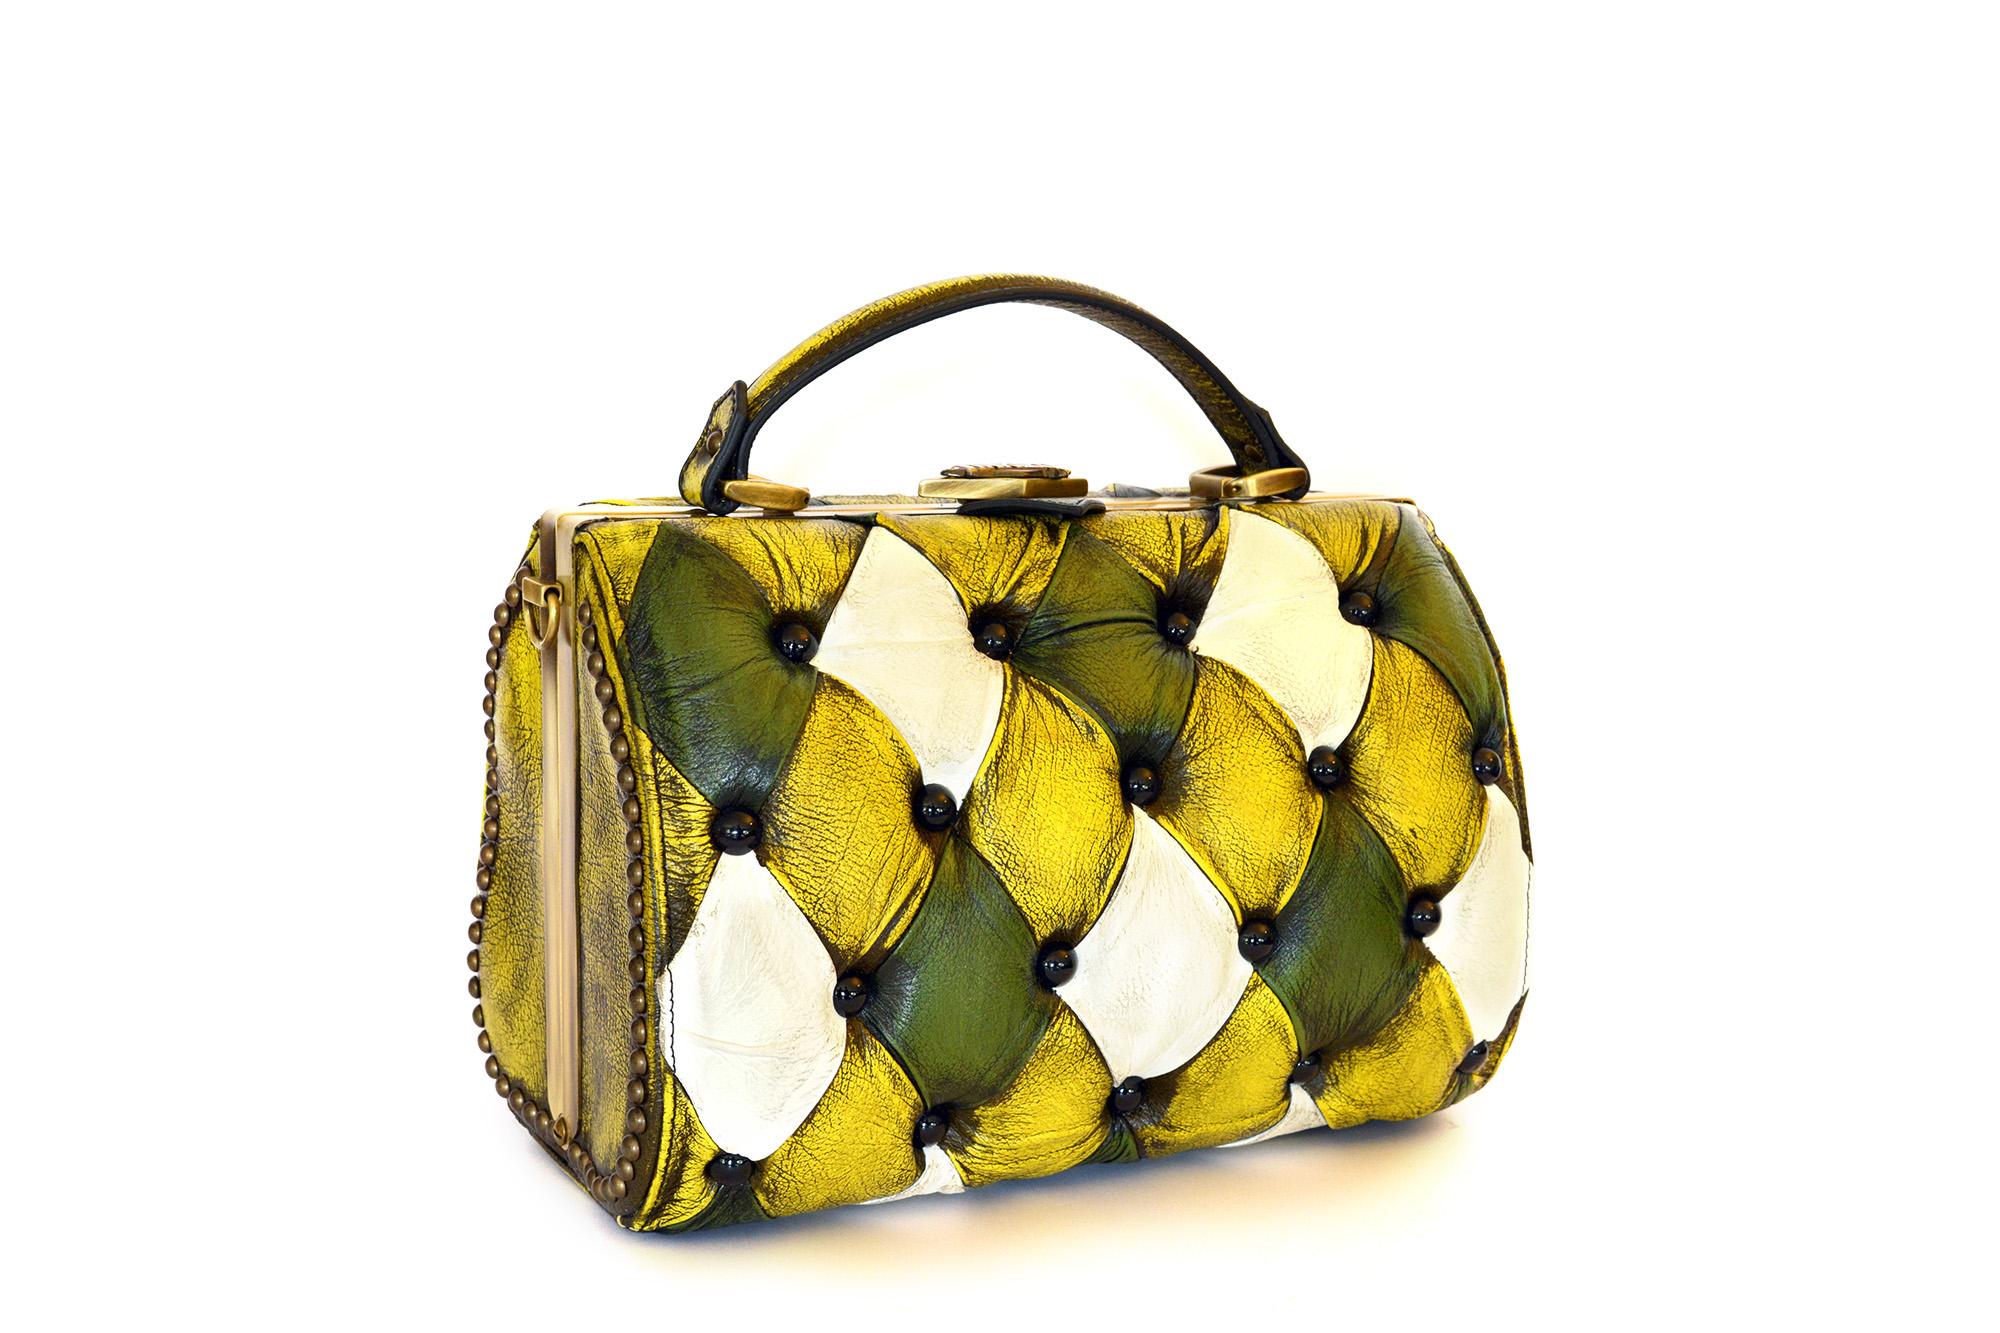 harleq-green-lemon-bag-luxury-leathers